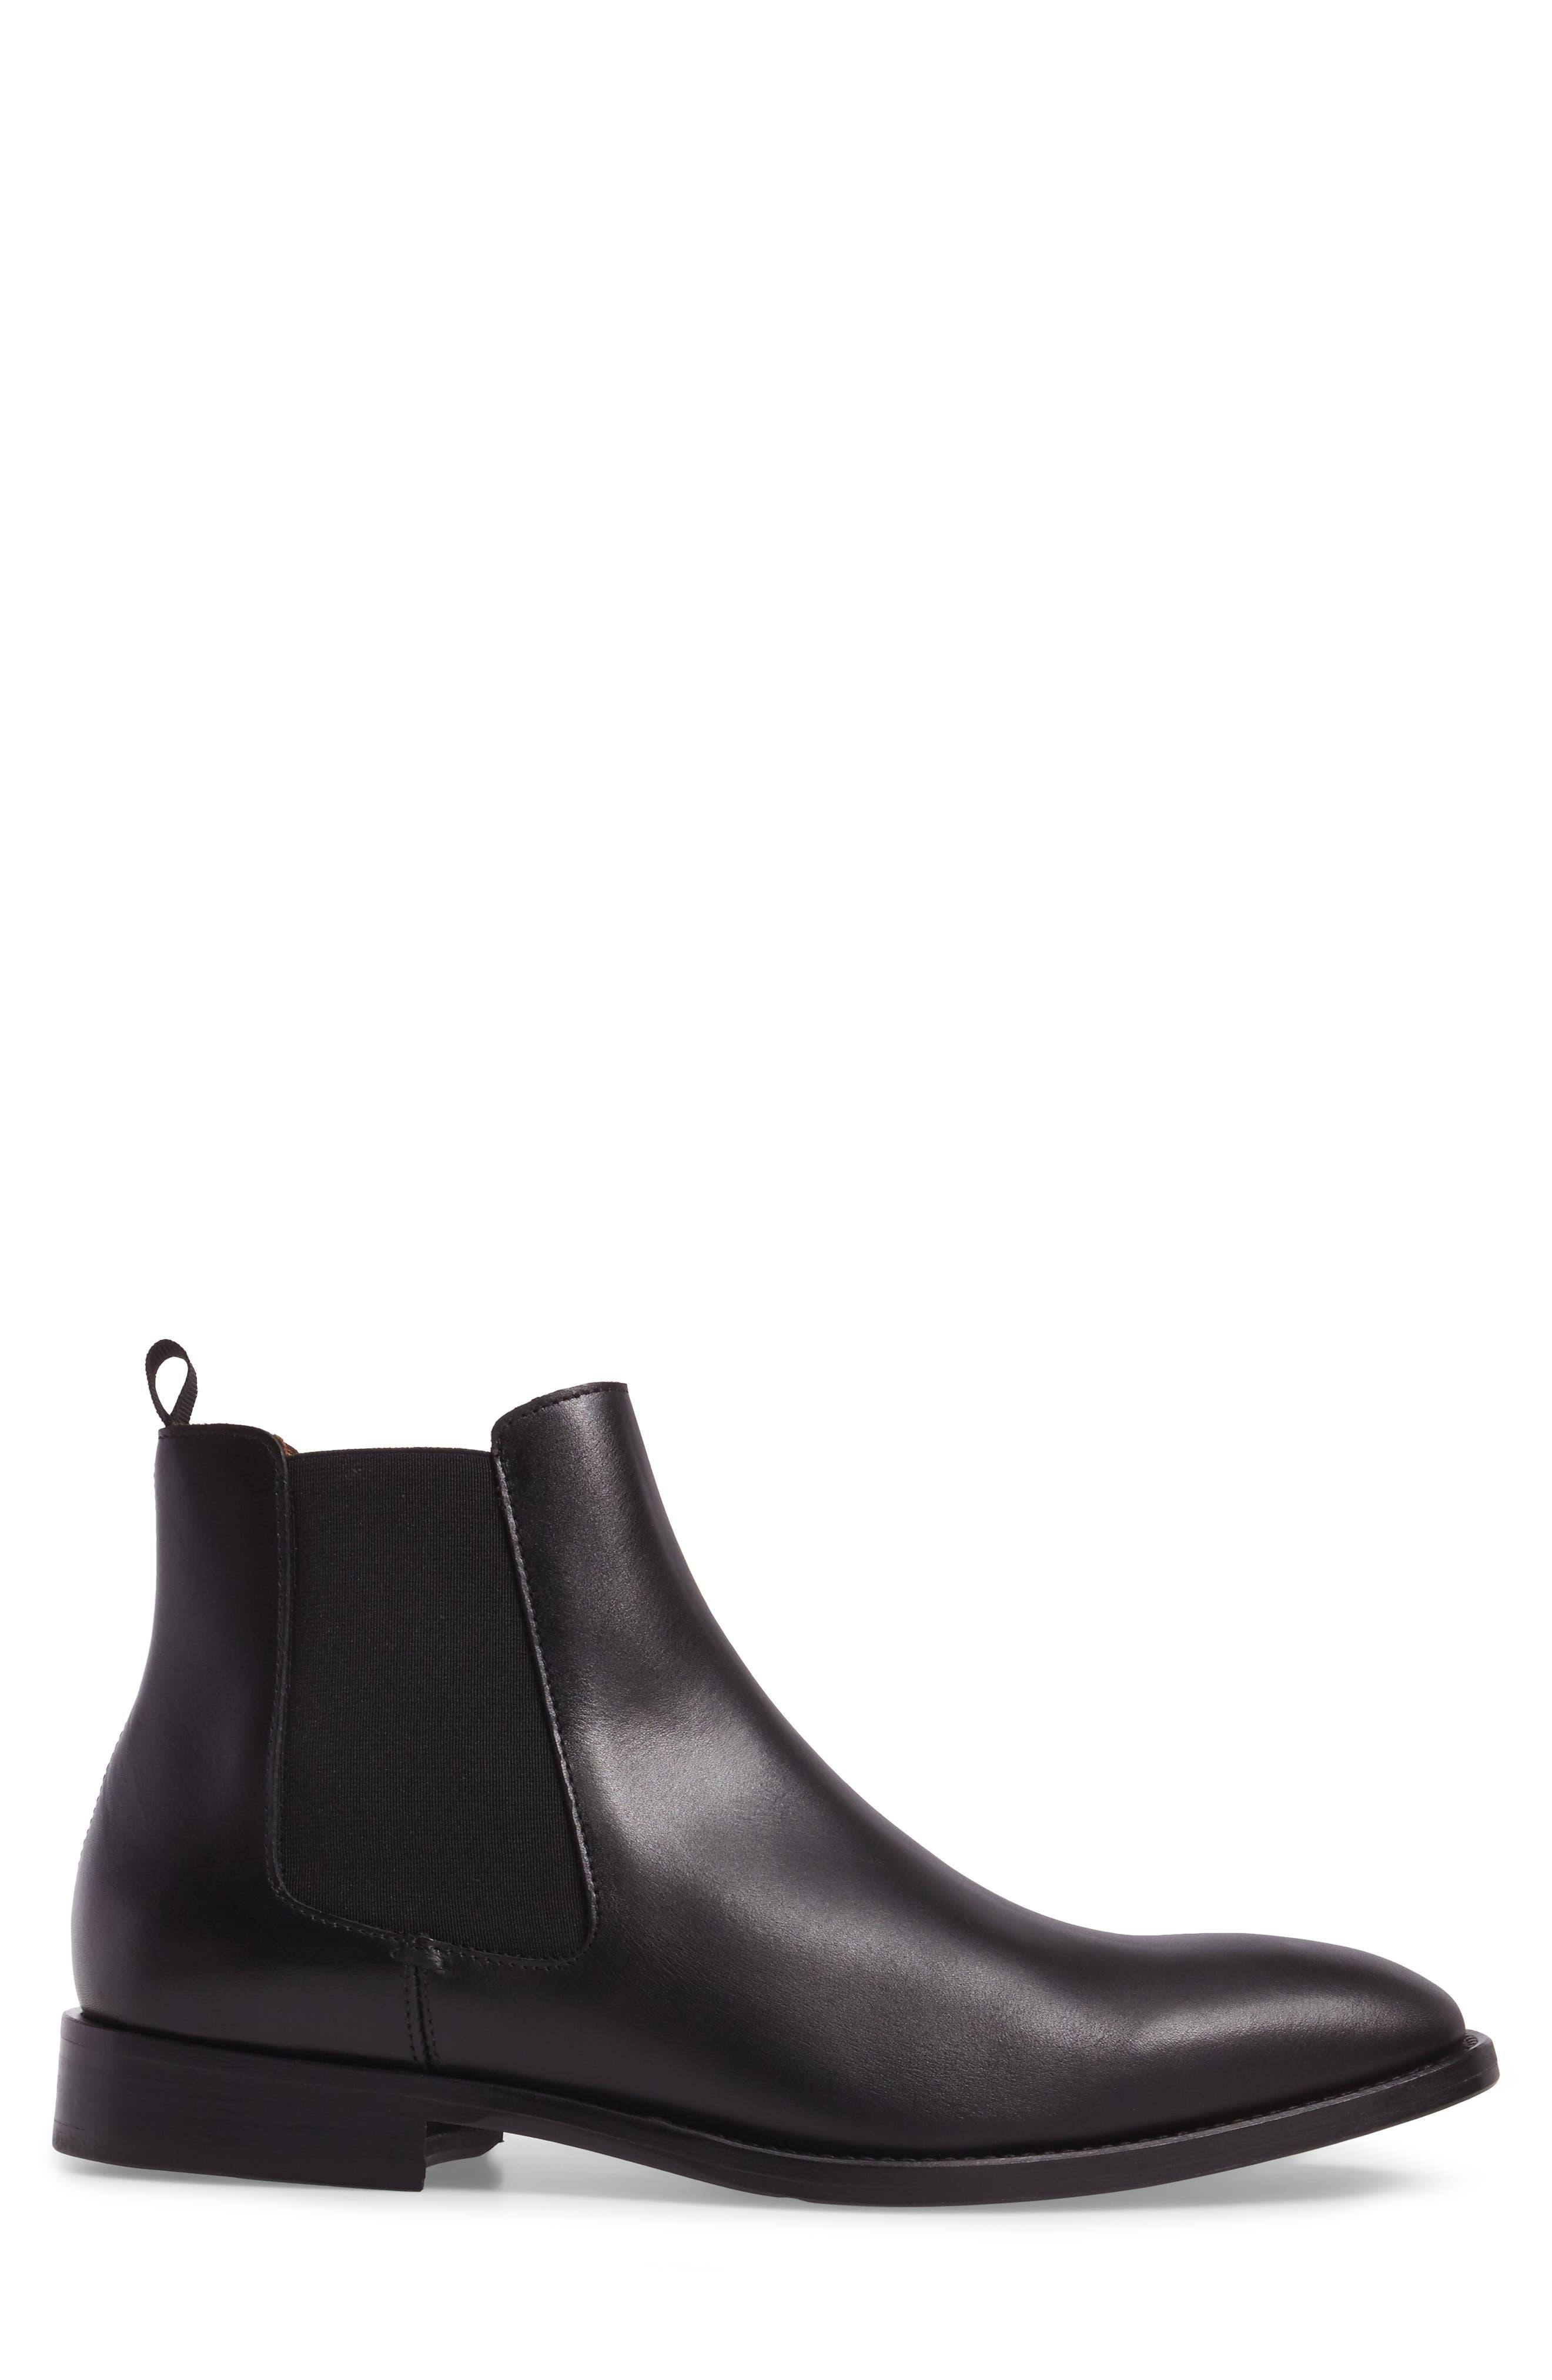 Haldien Chelsea Boot,                             Alternate thumbnail 3, color,                             Black Leather/ Elastic